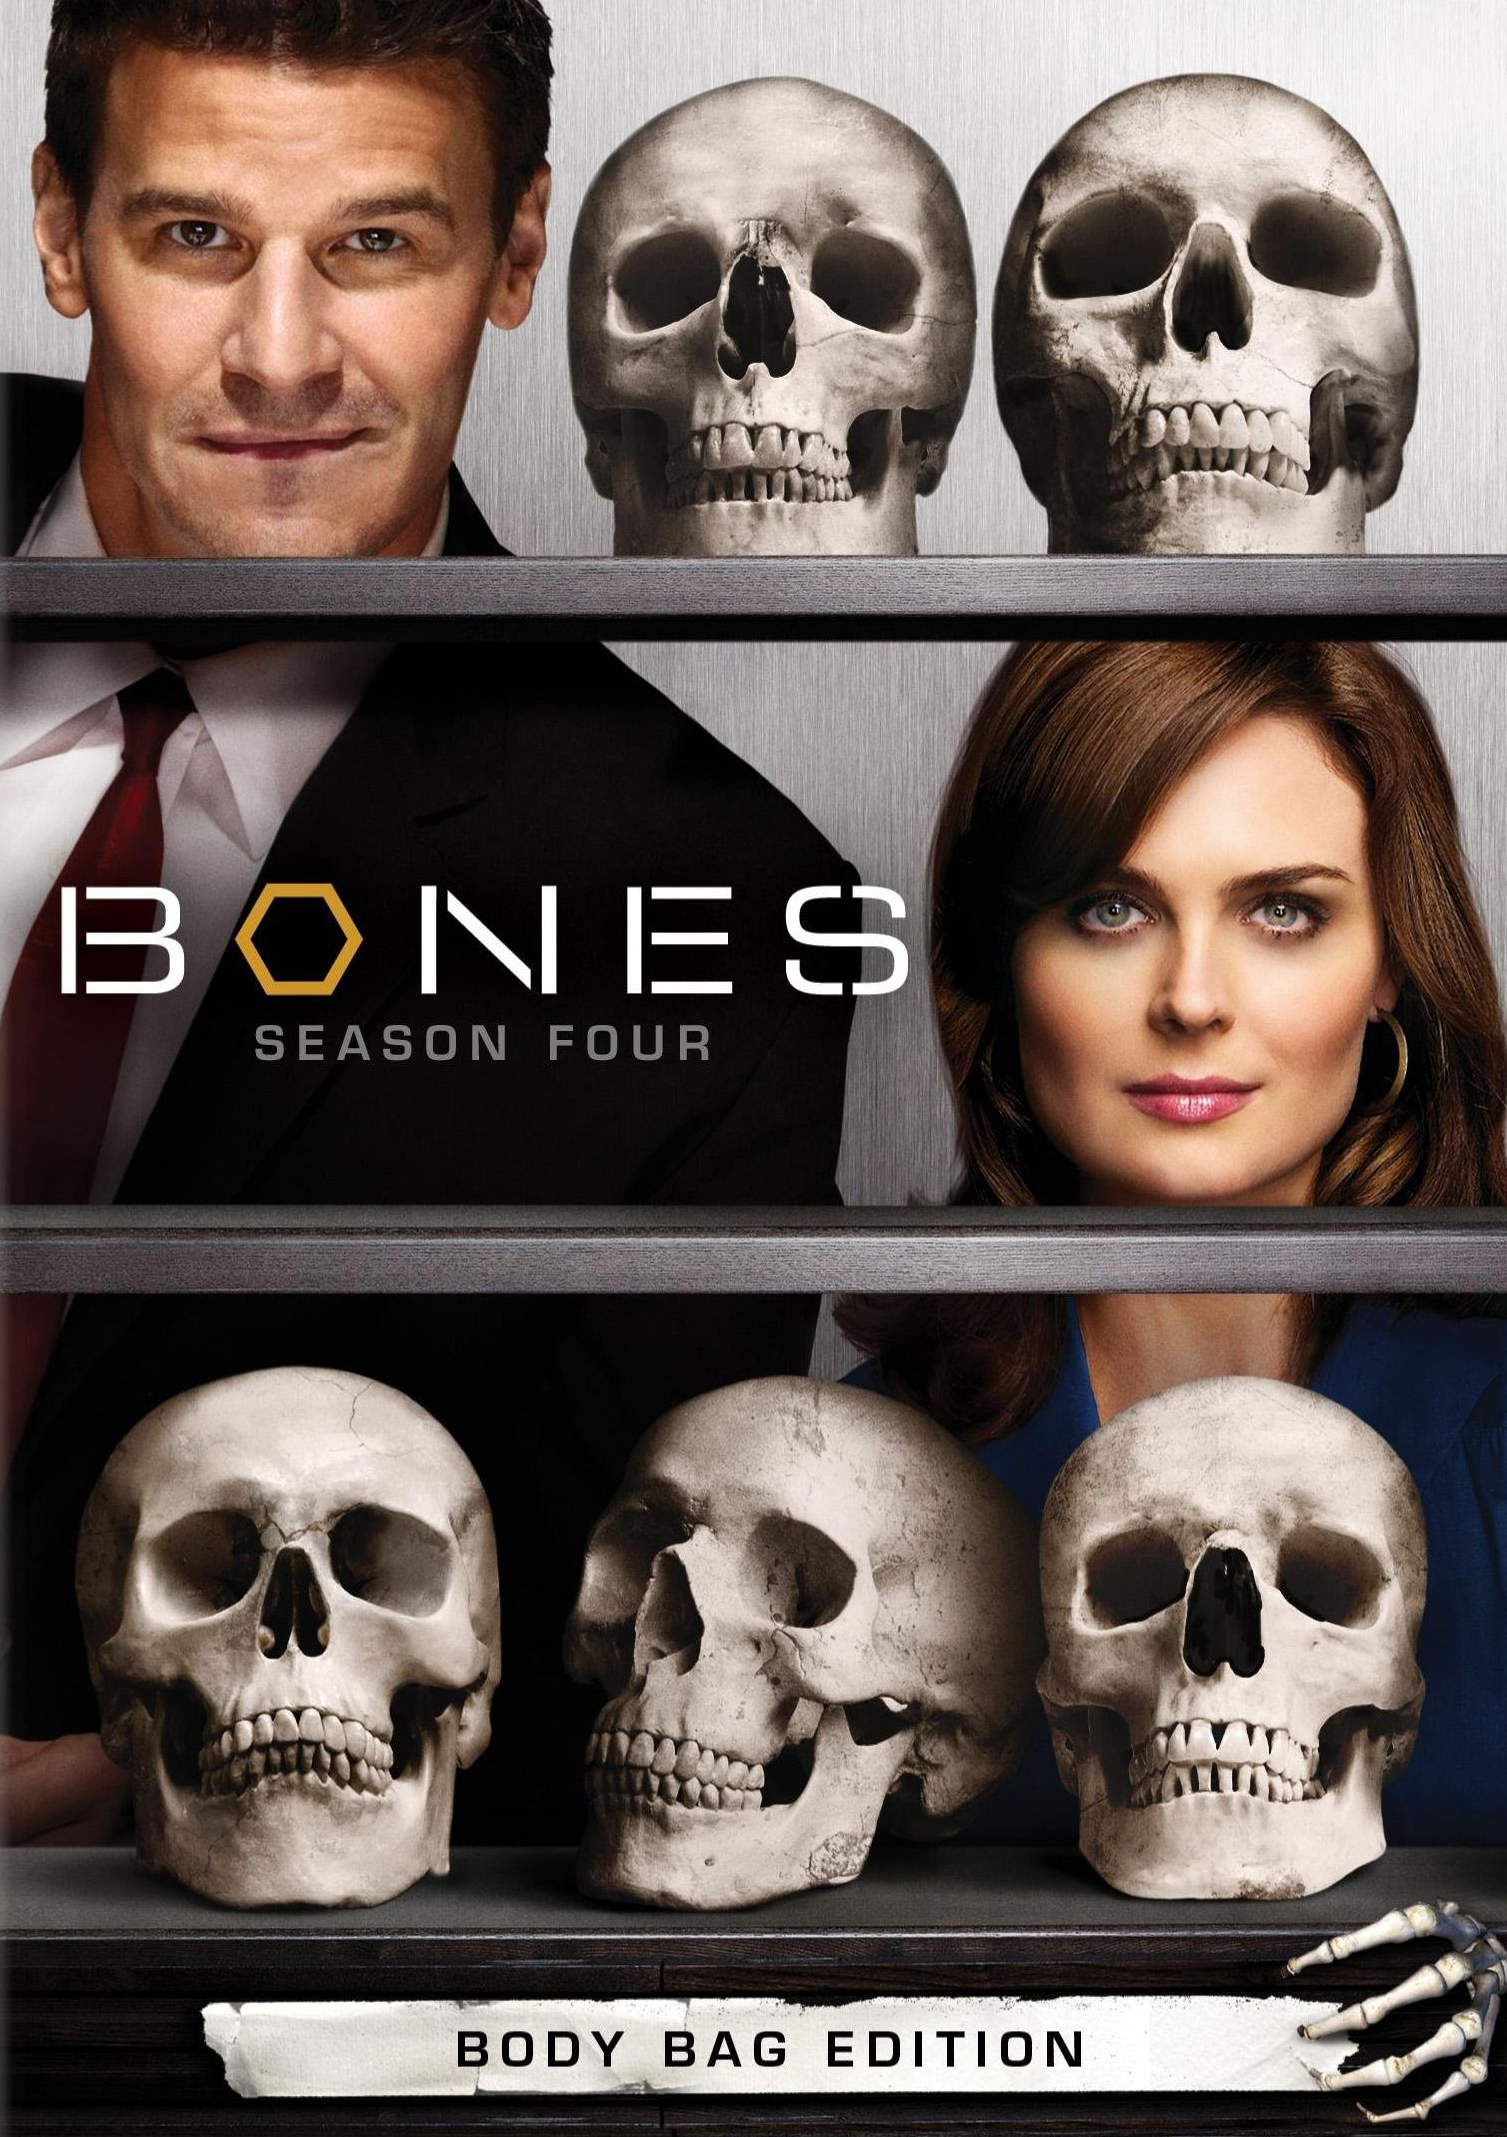 bones-season-4-poster-and-dvd-cover.jpg